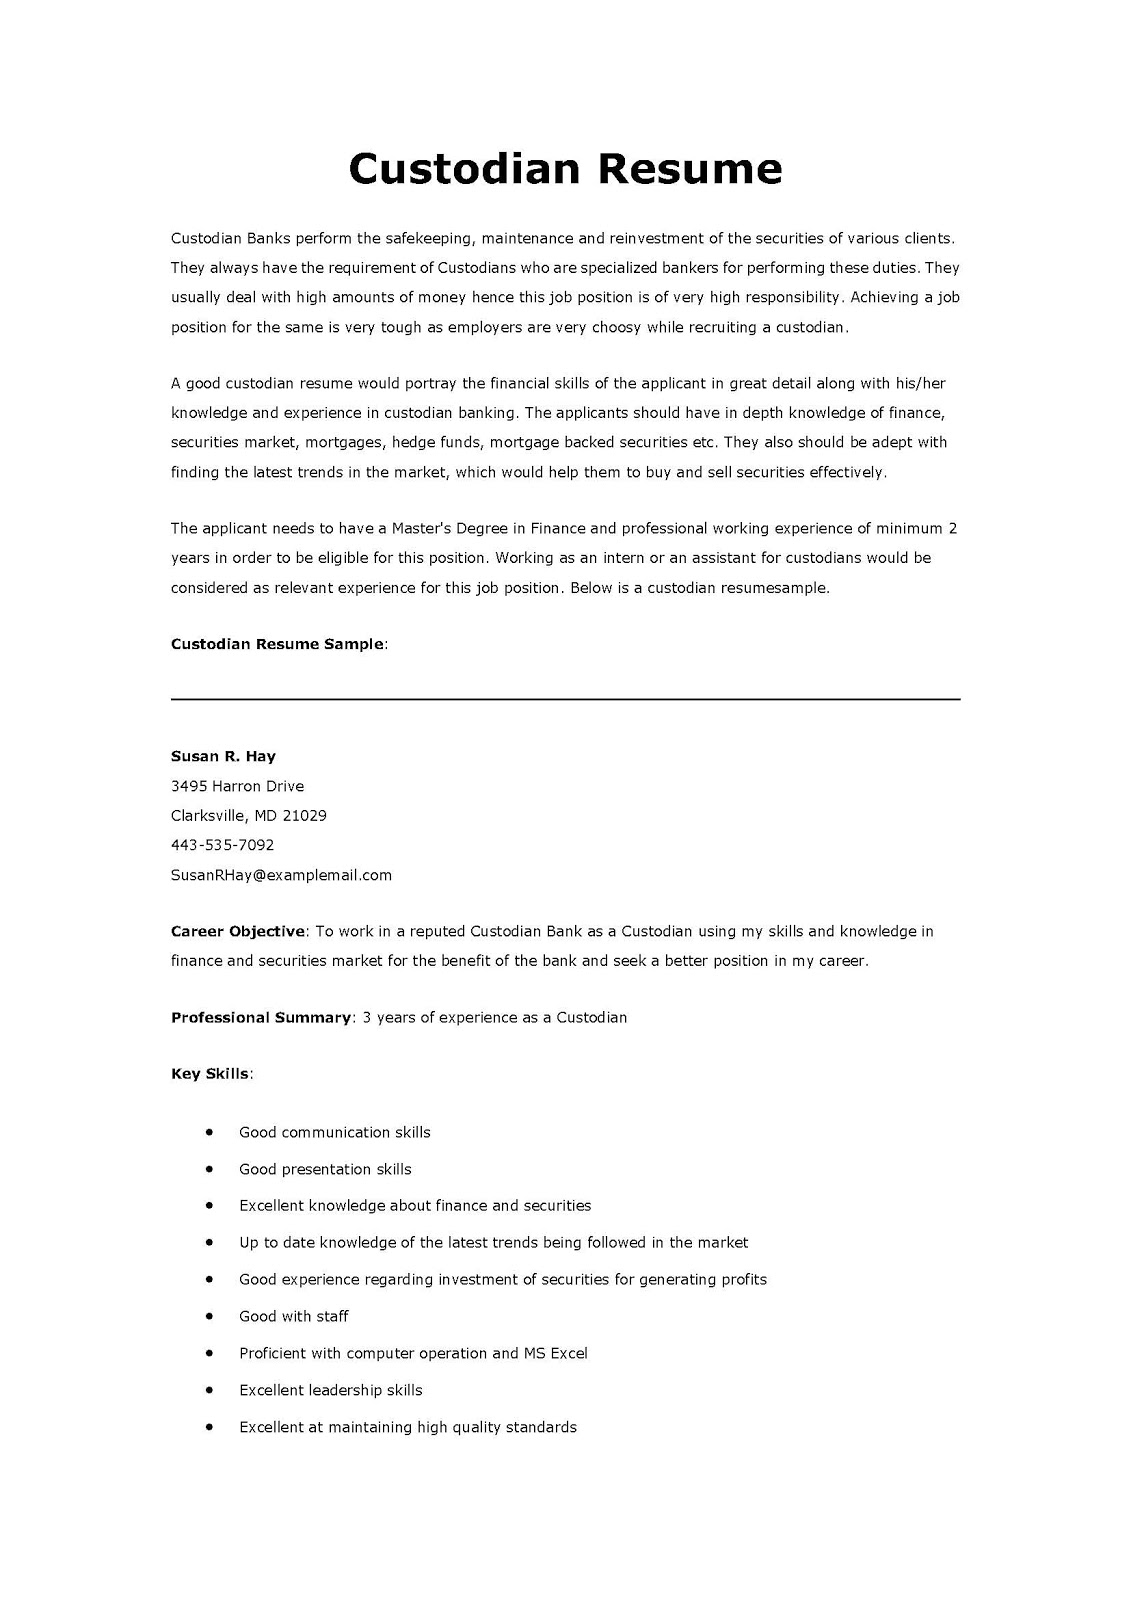 Elegant Les Precieuses Ridicules Petit Resume A Good Persuasive Essay Regarding Sample Custodian Resume